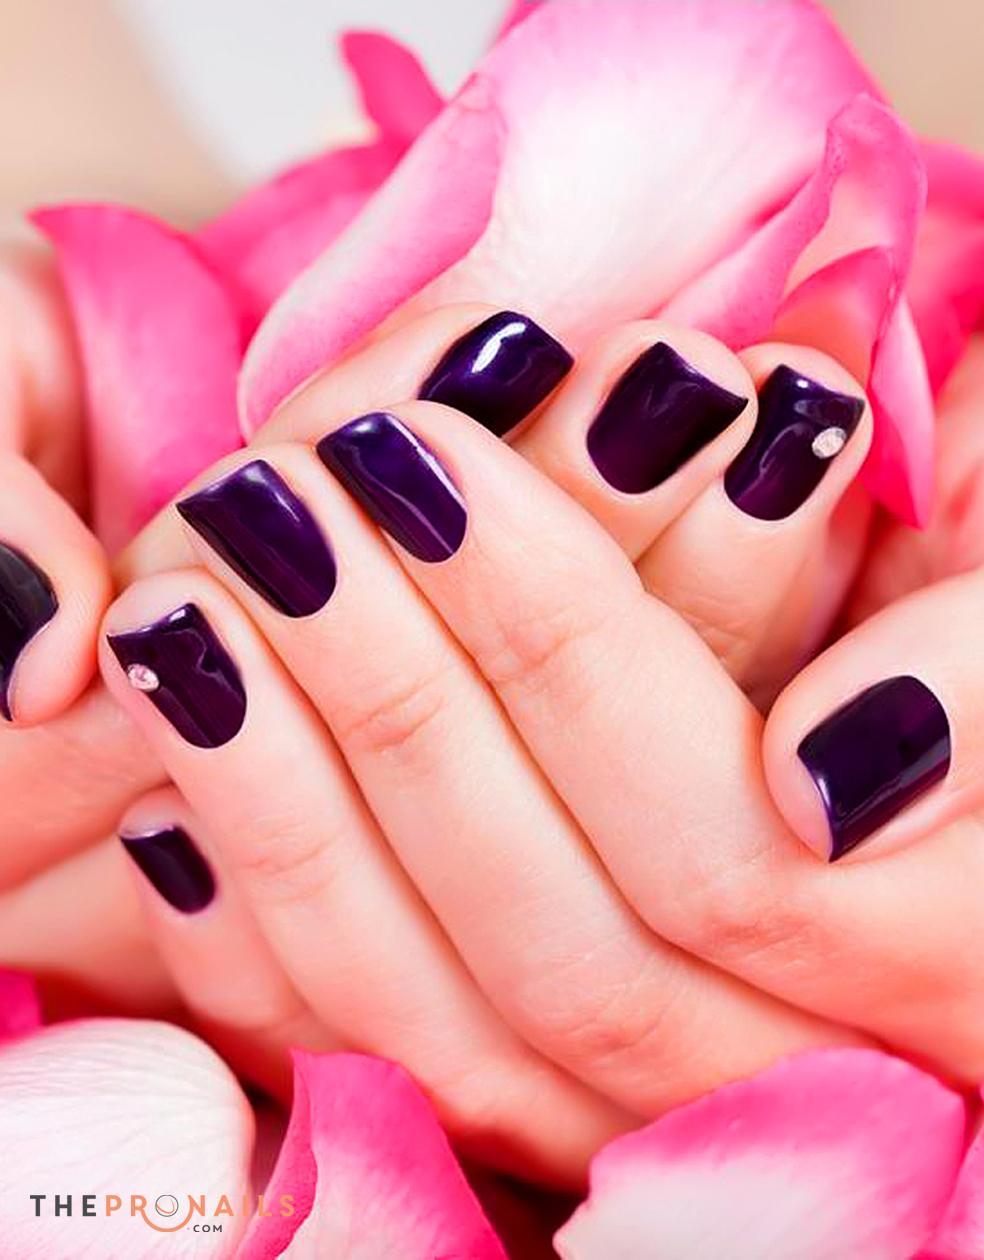 lume gel nails photo - 1